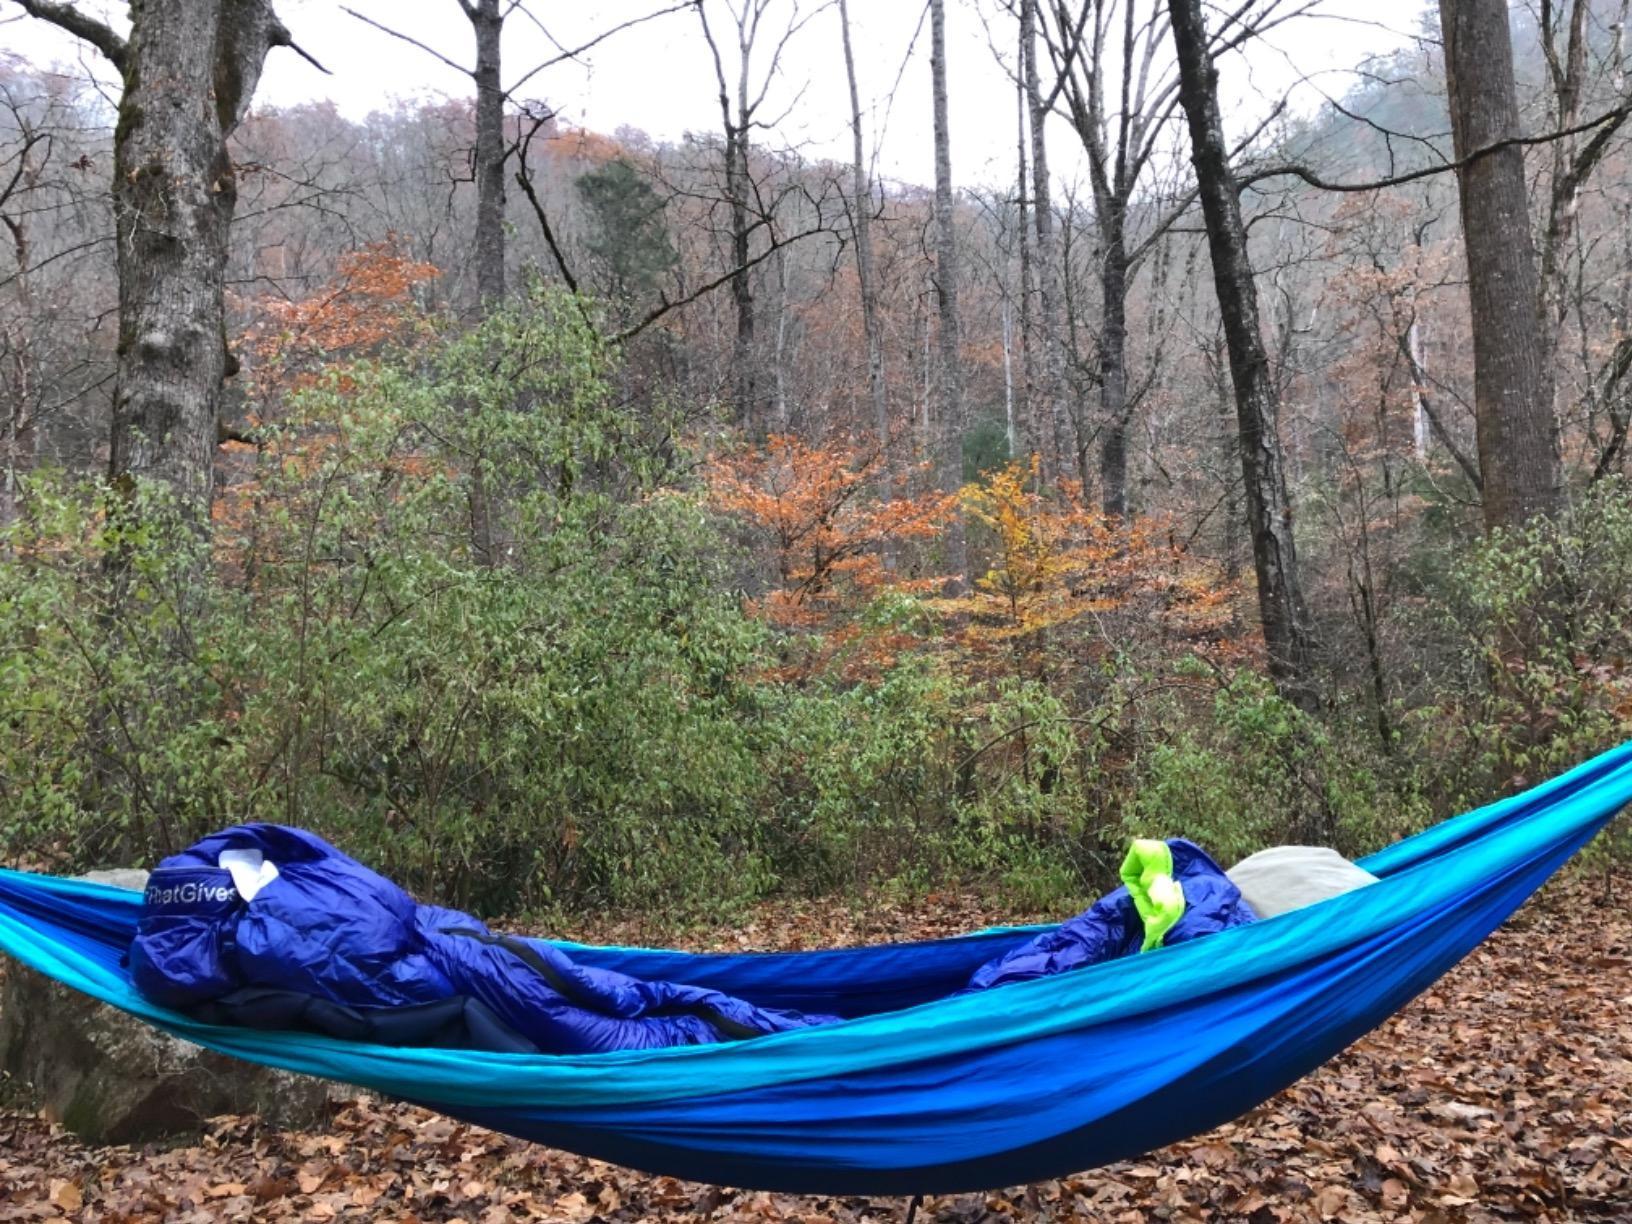 Hyke & Byke Hammock Underquilt/Down Sleeping Bag-Sleeping outside at 28 degrees- so cozy so freaking great